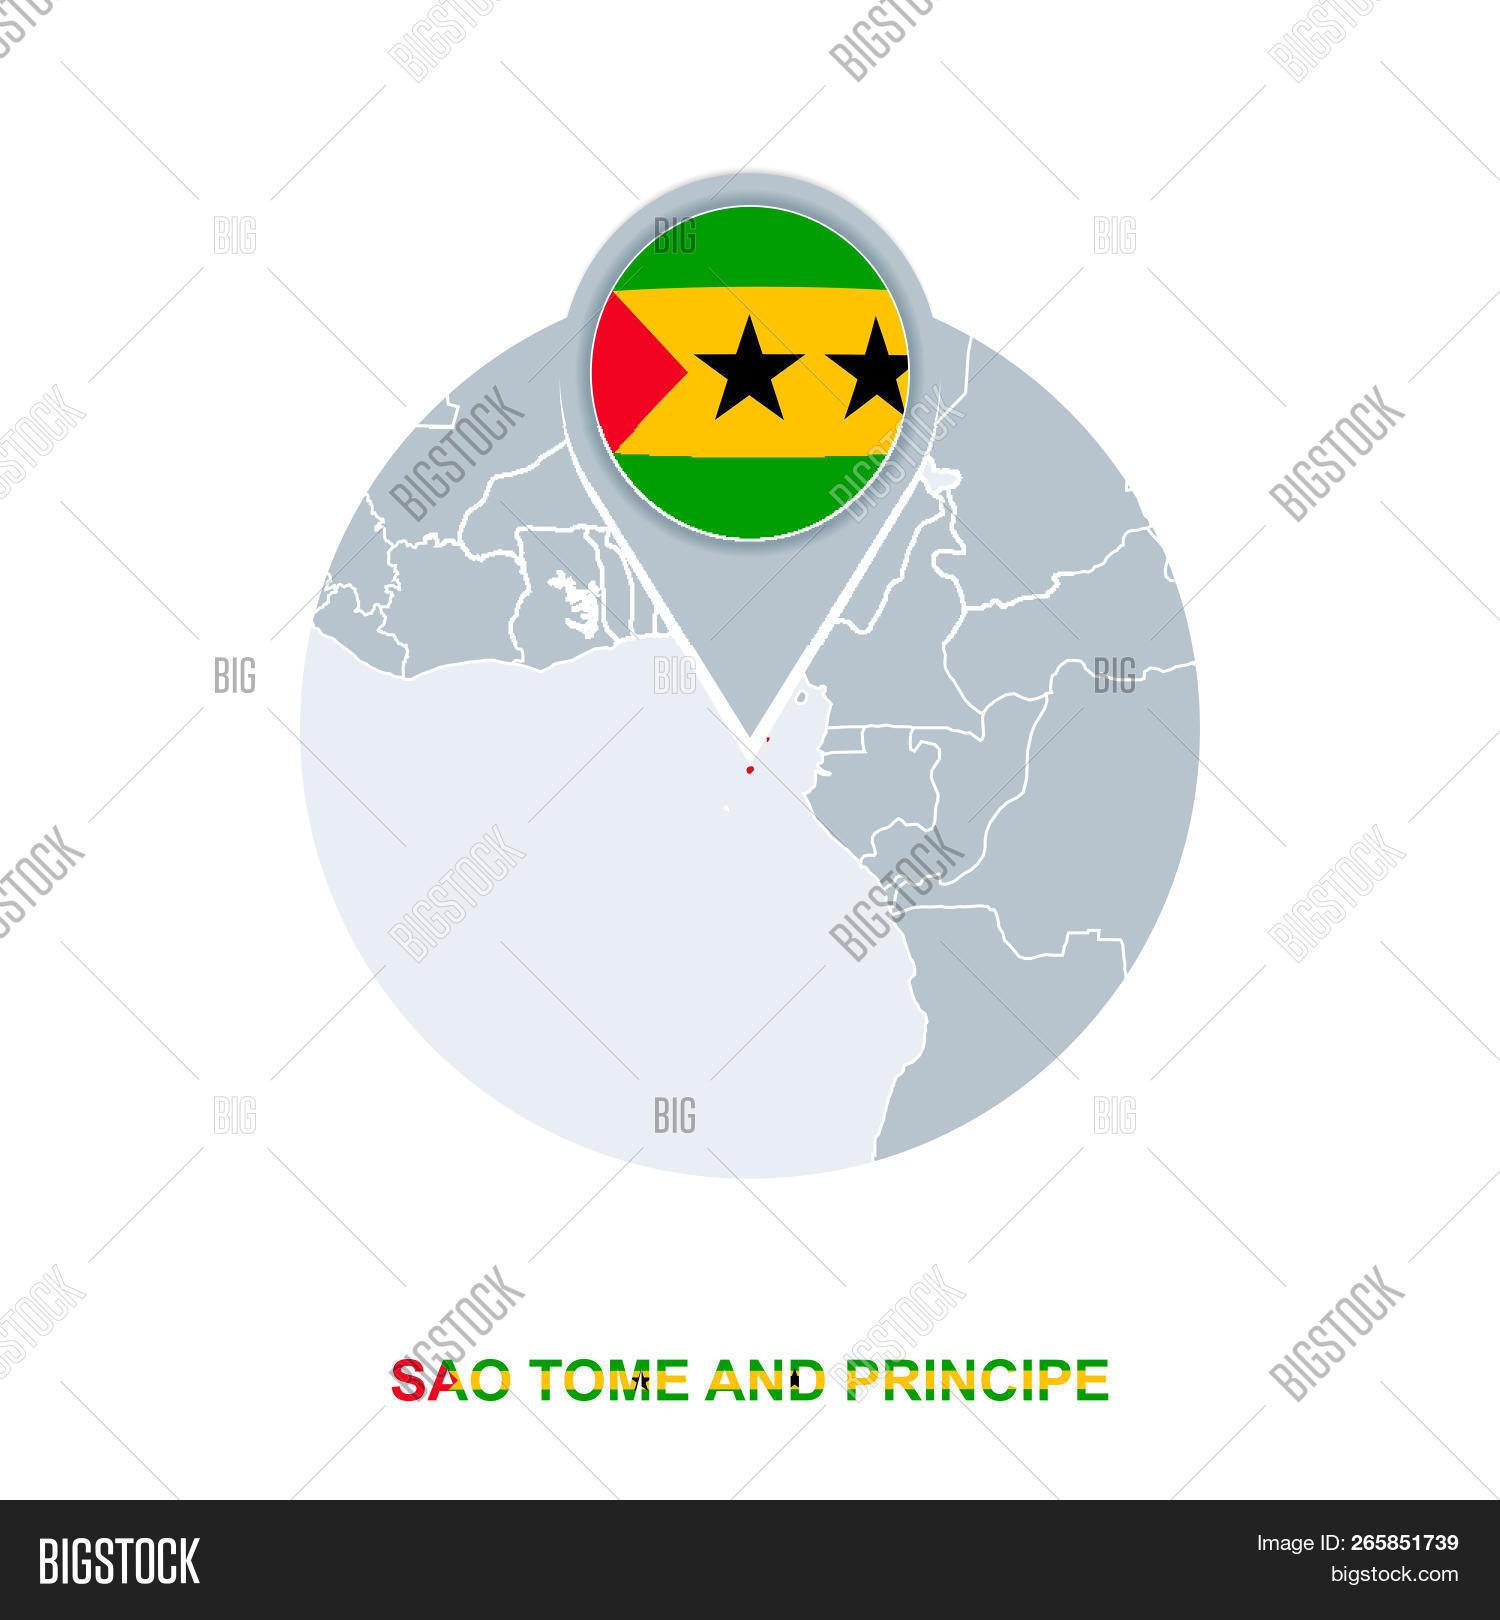 Sao Tome Principe Map Vector & Photo (Free Trial) | Bigstock Sao Tome Principe Map on eritrea map, hong kong map, u.a.e. map, saudi arabia map, seychelles map, trinidad & tobago map, united arab emirates map, tanzania map, central african republic map, principe island map, bangladesh map, comoros map, tunisia map, niue map, honshu island map, tokelau map, sri lanka map, lesotho map, new britain island map,